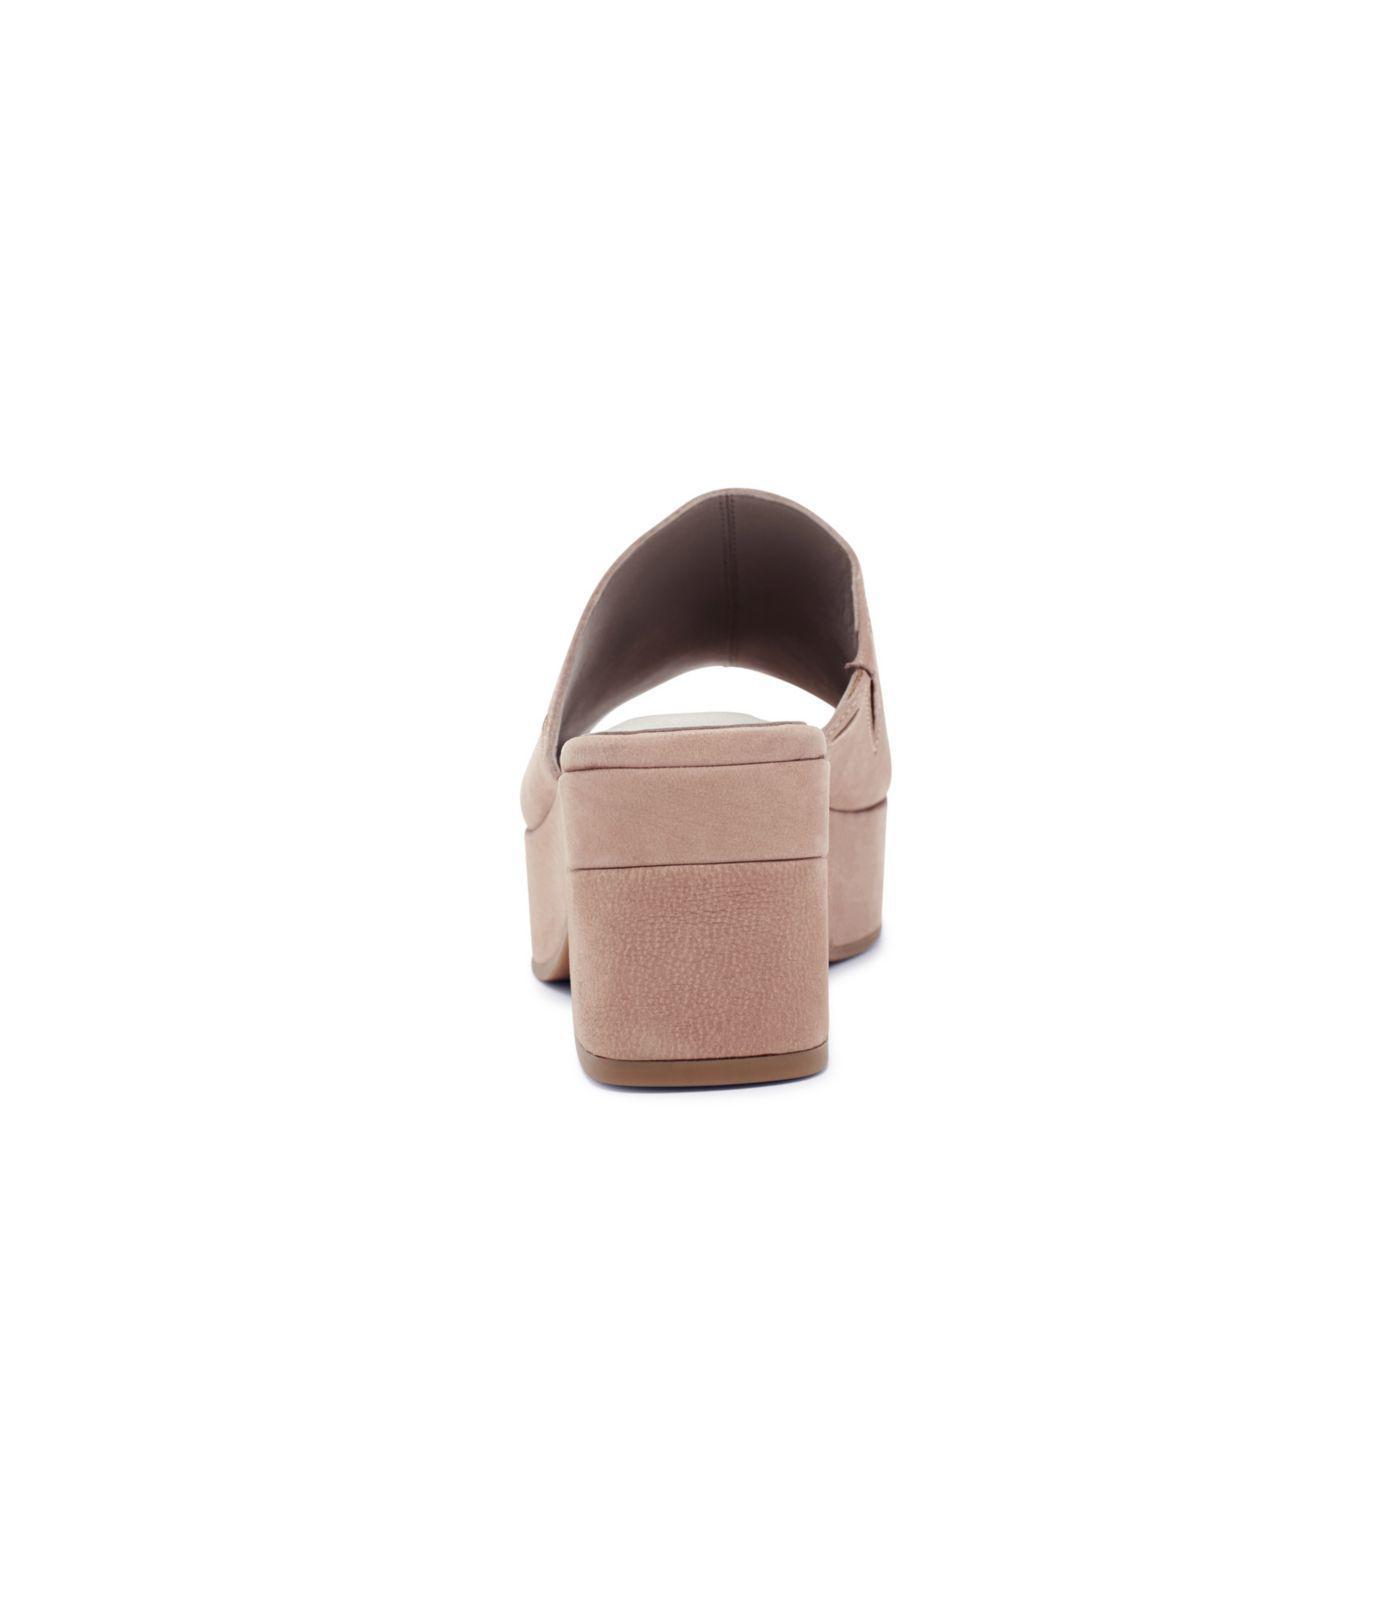 8cdd3f7da50 Lyst - Eileen Fisher Tumbled Nubuck Dana Platform Sandal